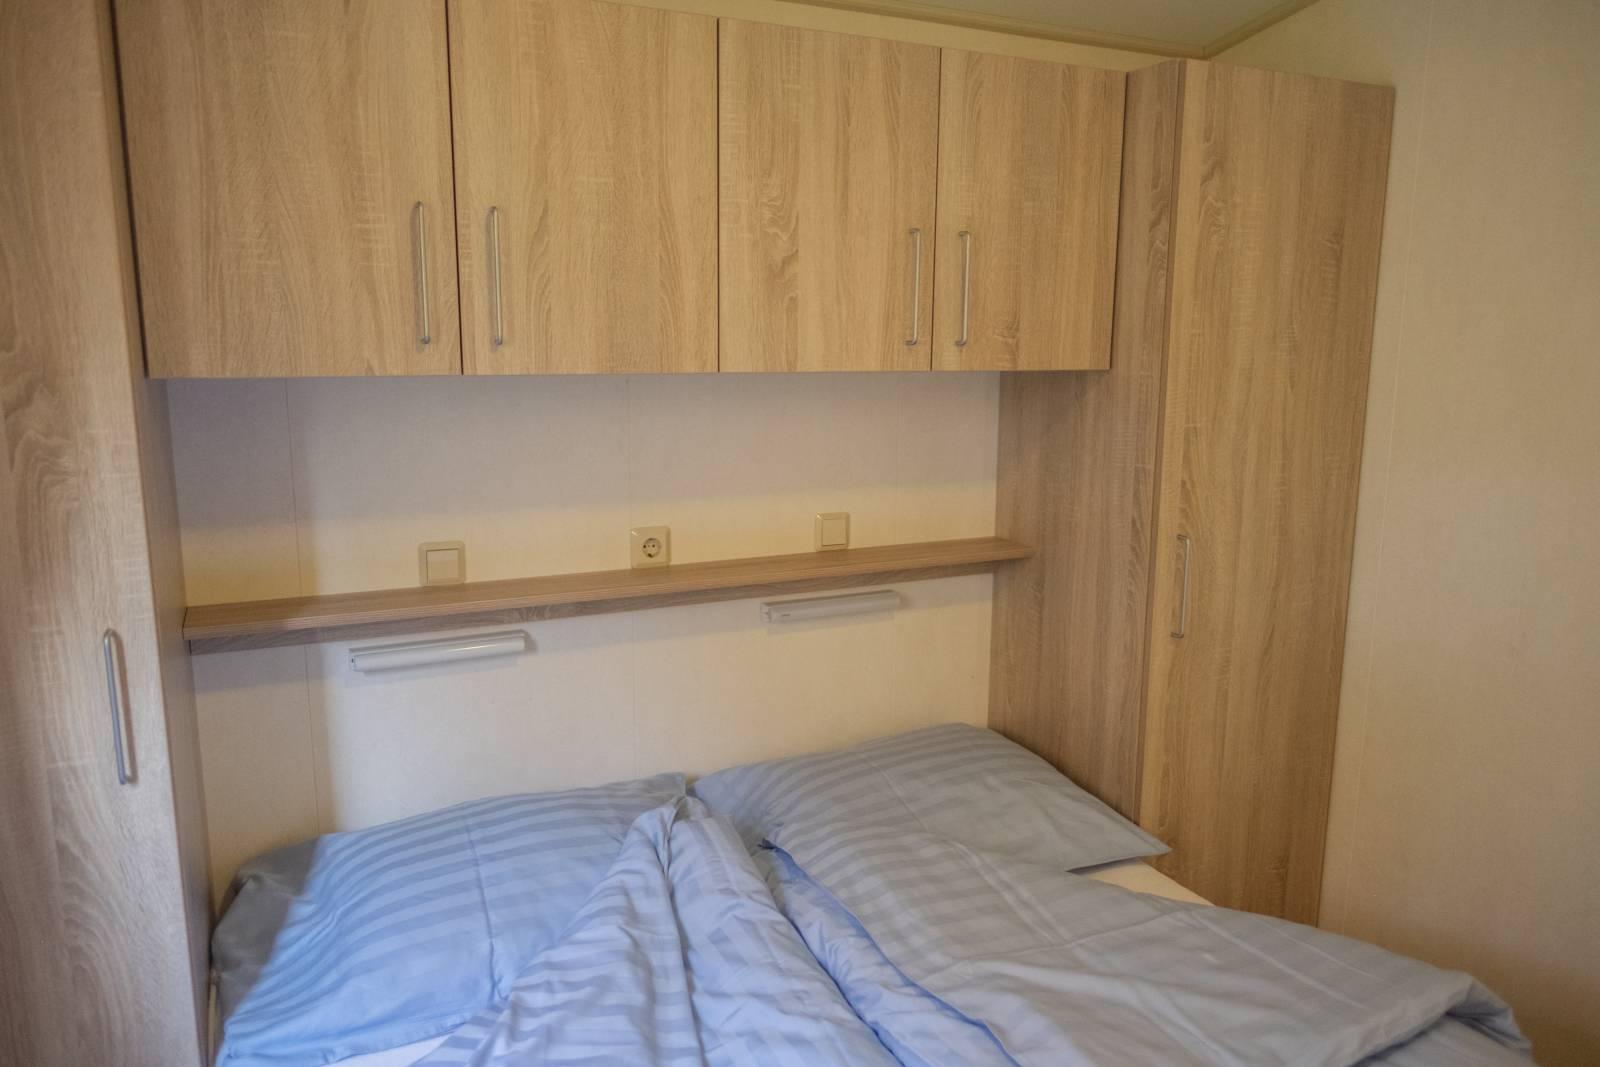 Chalet type 2, slaapkamer 1